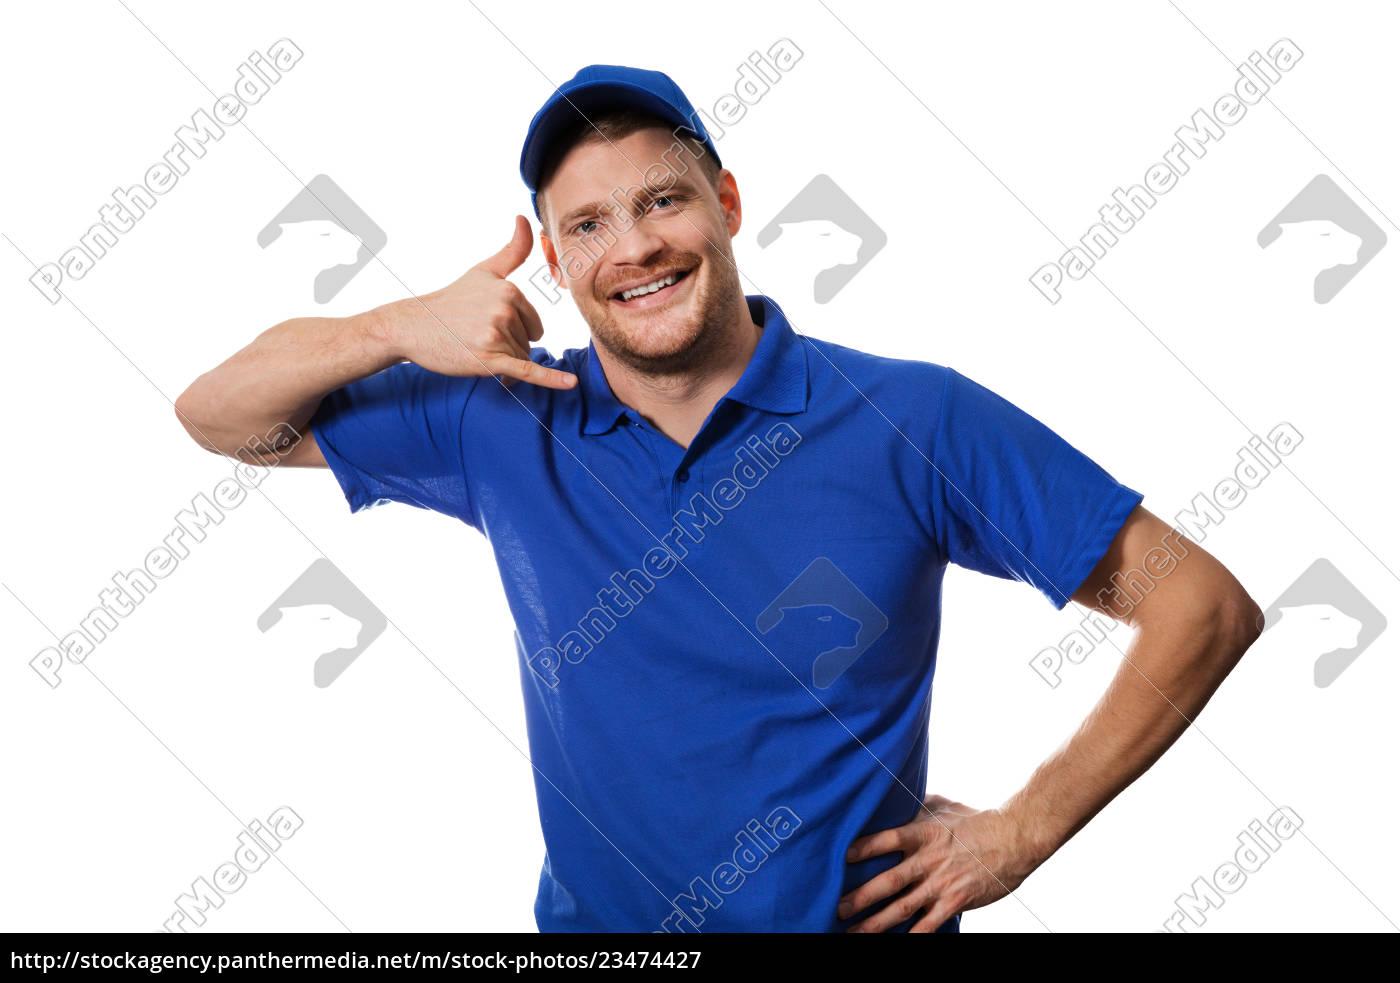 handyman, services, -, worker, in, blue - 23474427